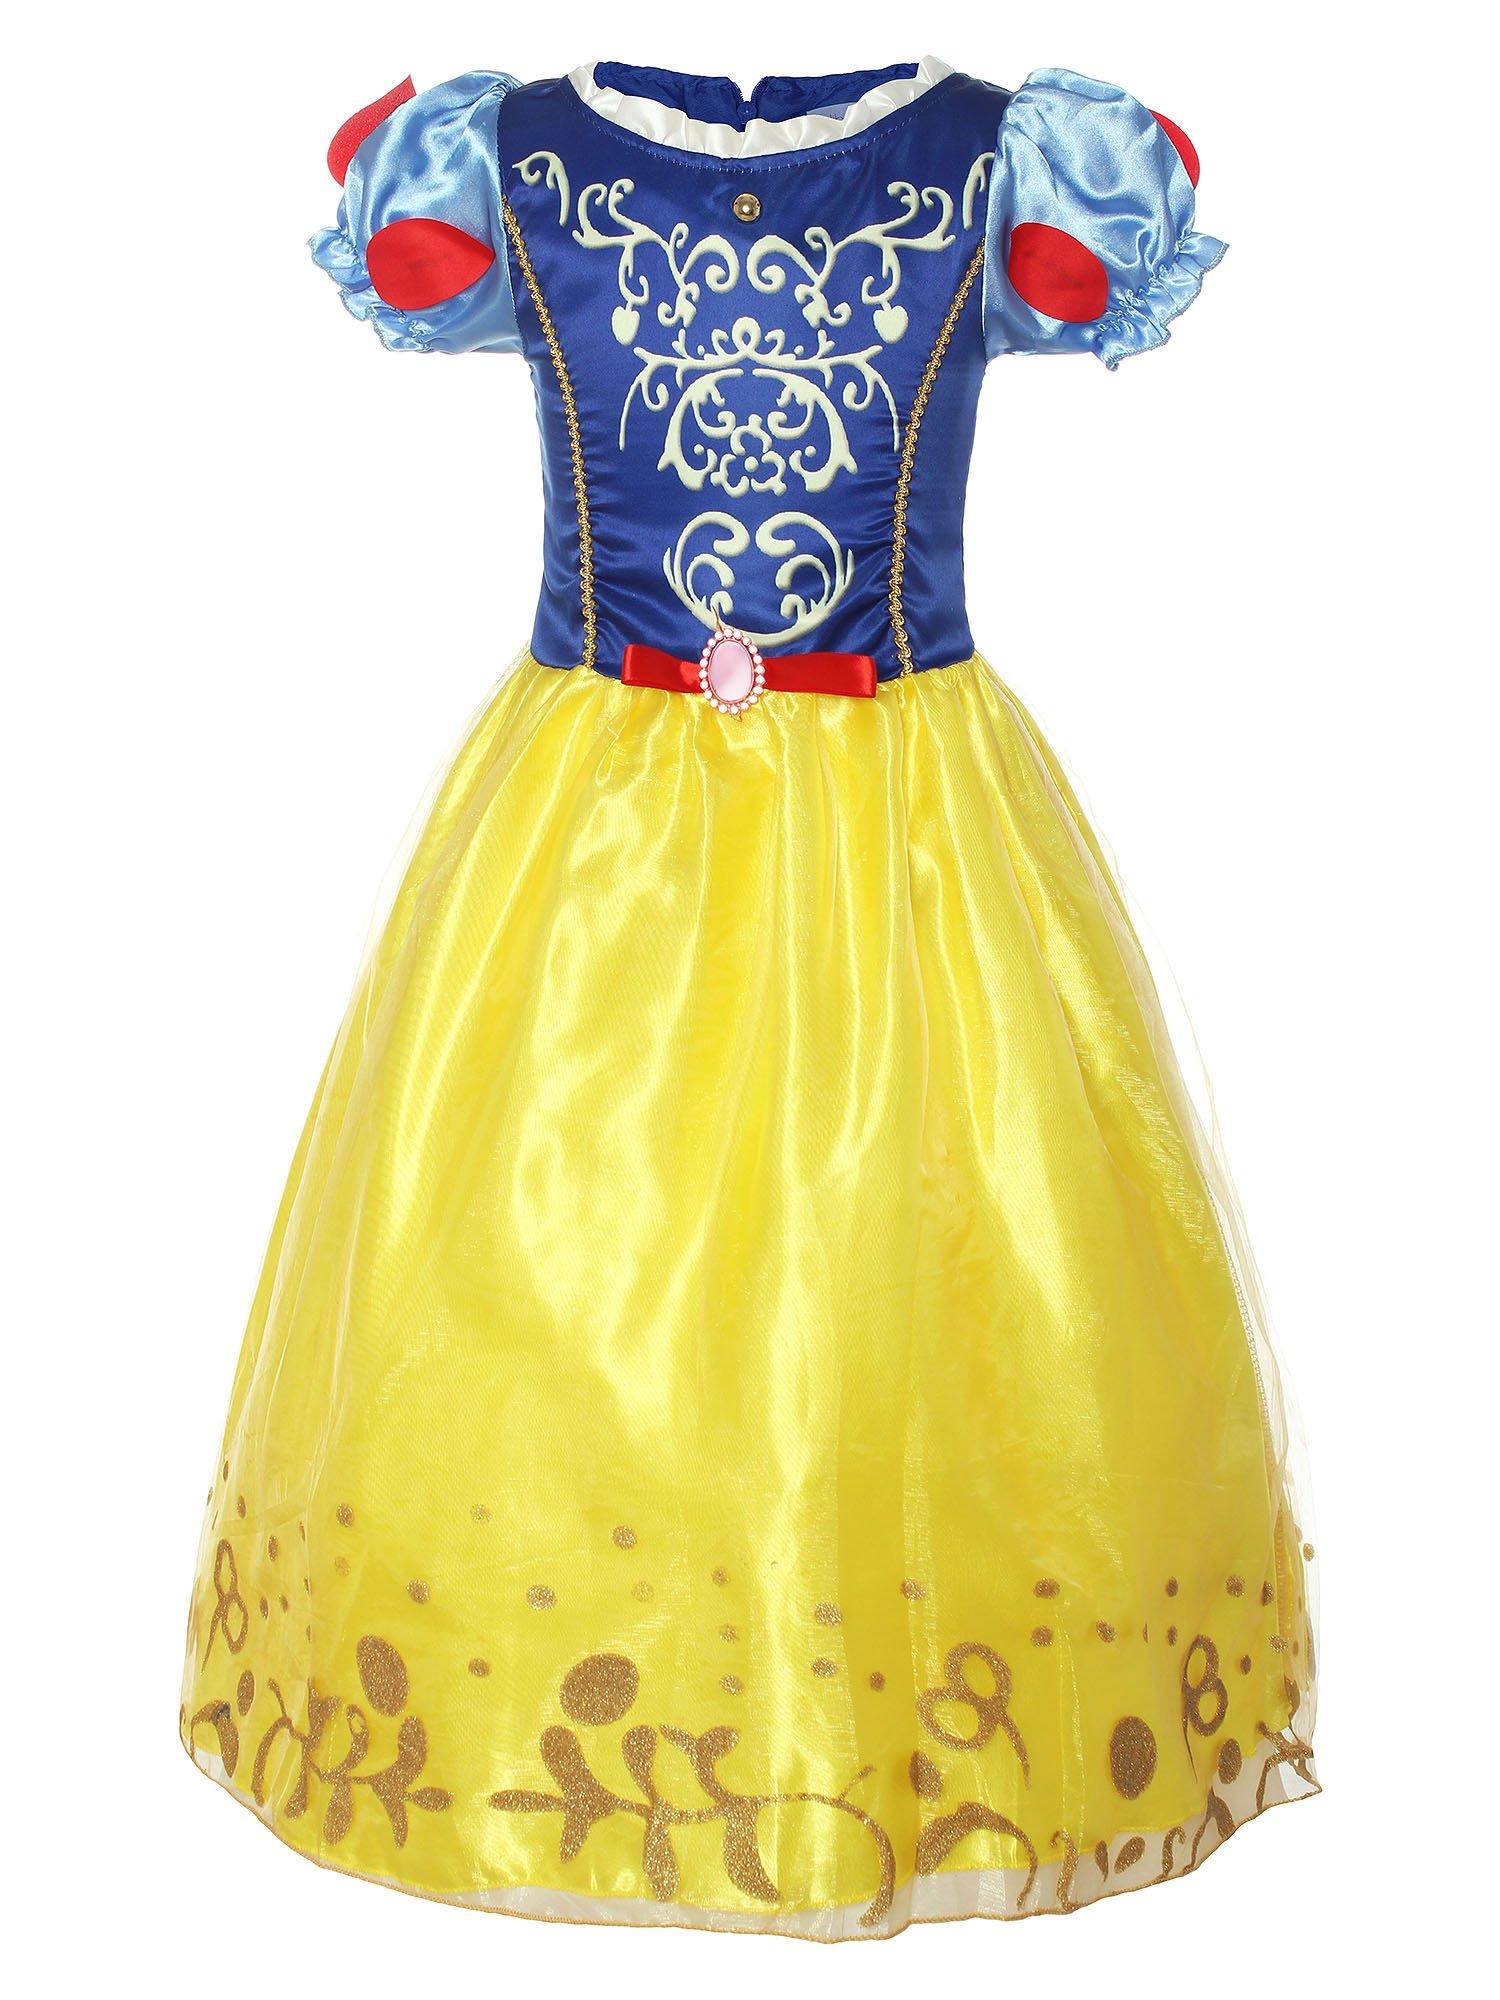 ReliBeauty Little Girls Puff Sleeve Princess Snow White Dress up Costume, Royal&Yellow, 2T-3T